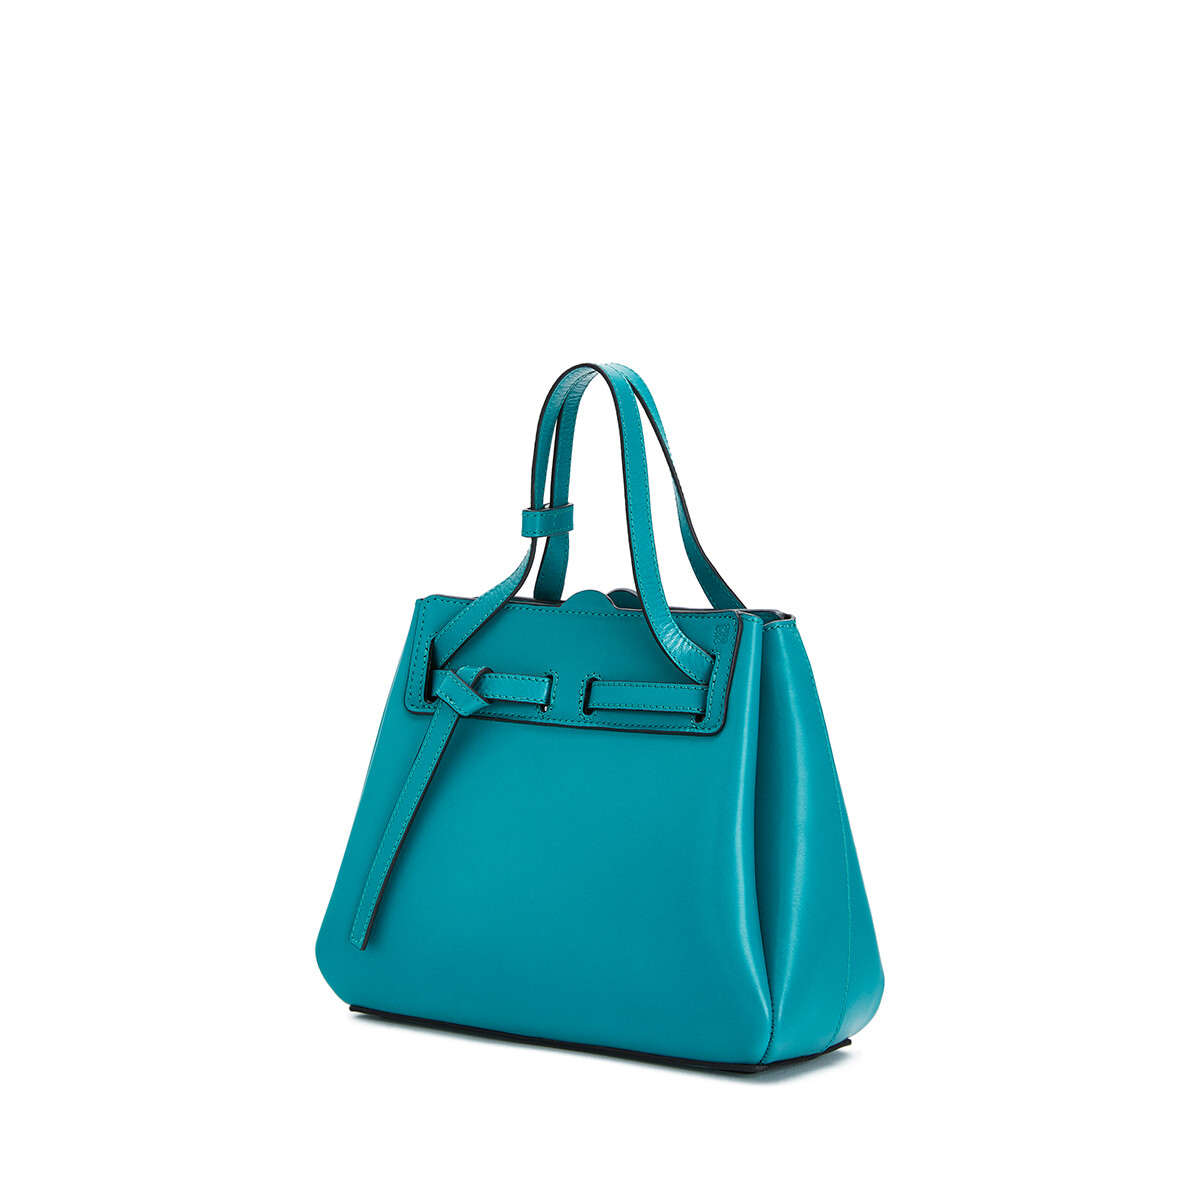 LOEWE Lazo Mini Bag emerald green front